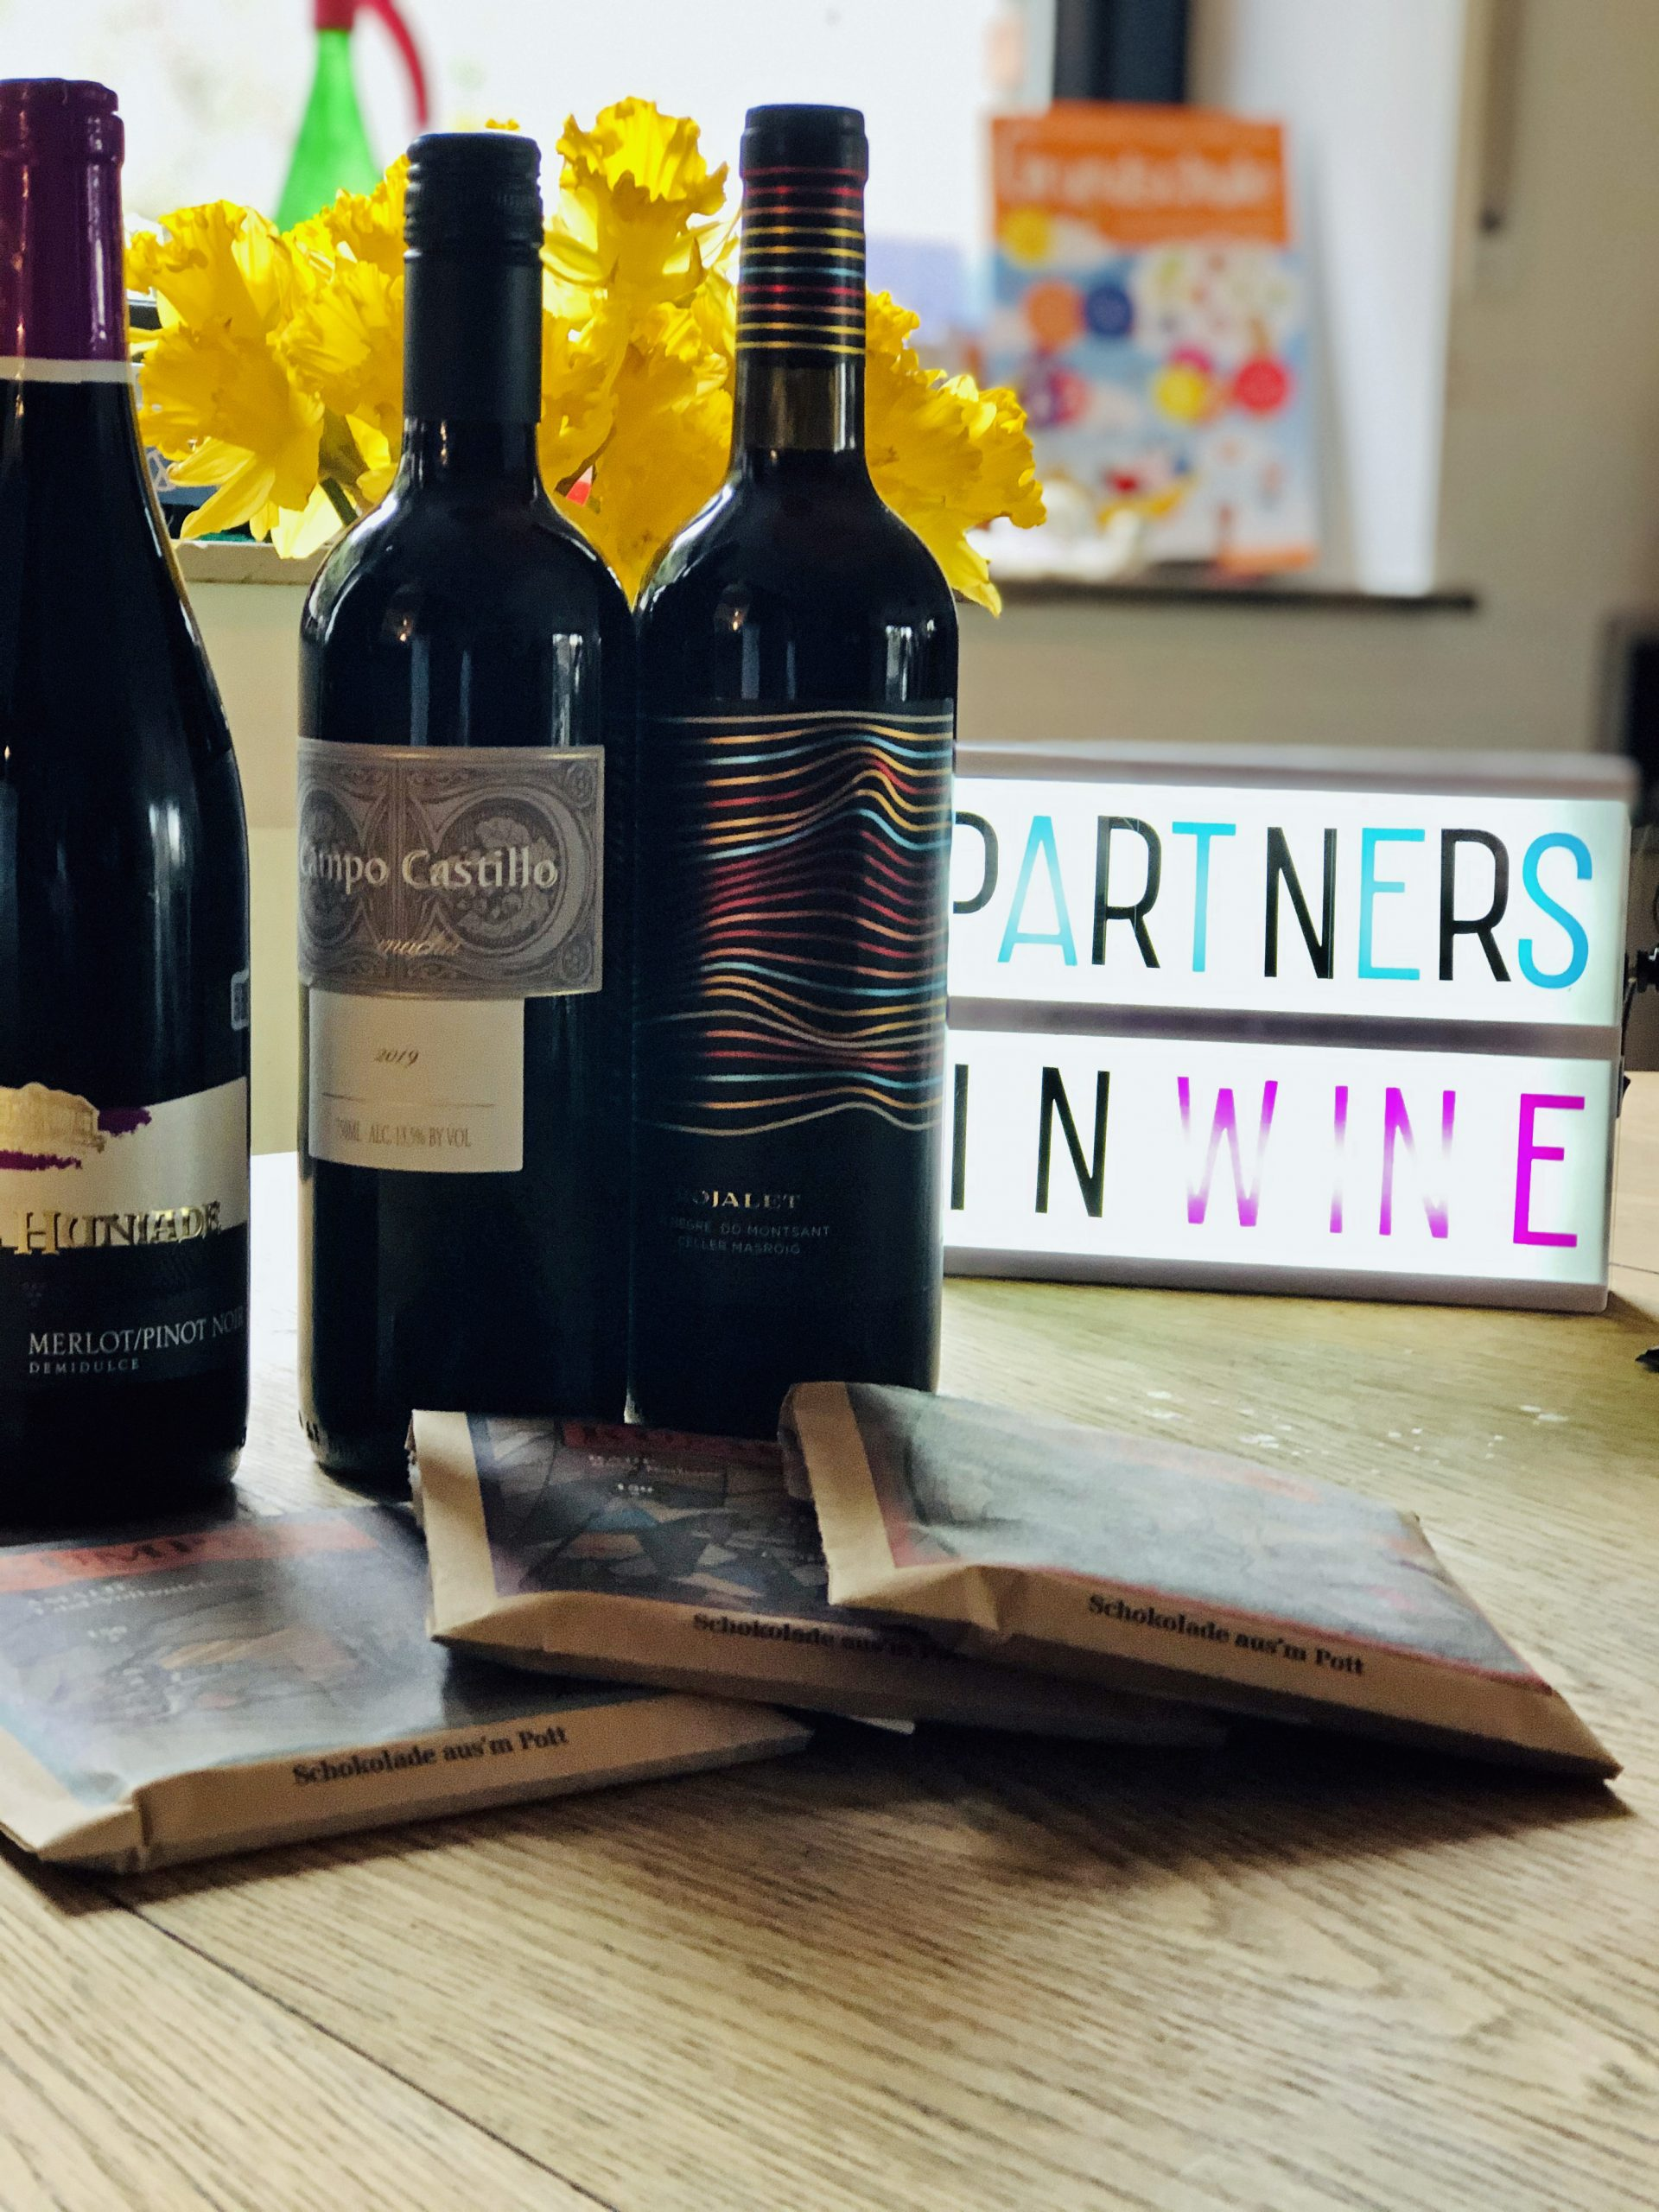 Drei Flaschen Wein und drei Tafeln Kumpelschokolade